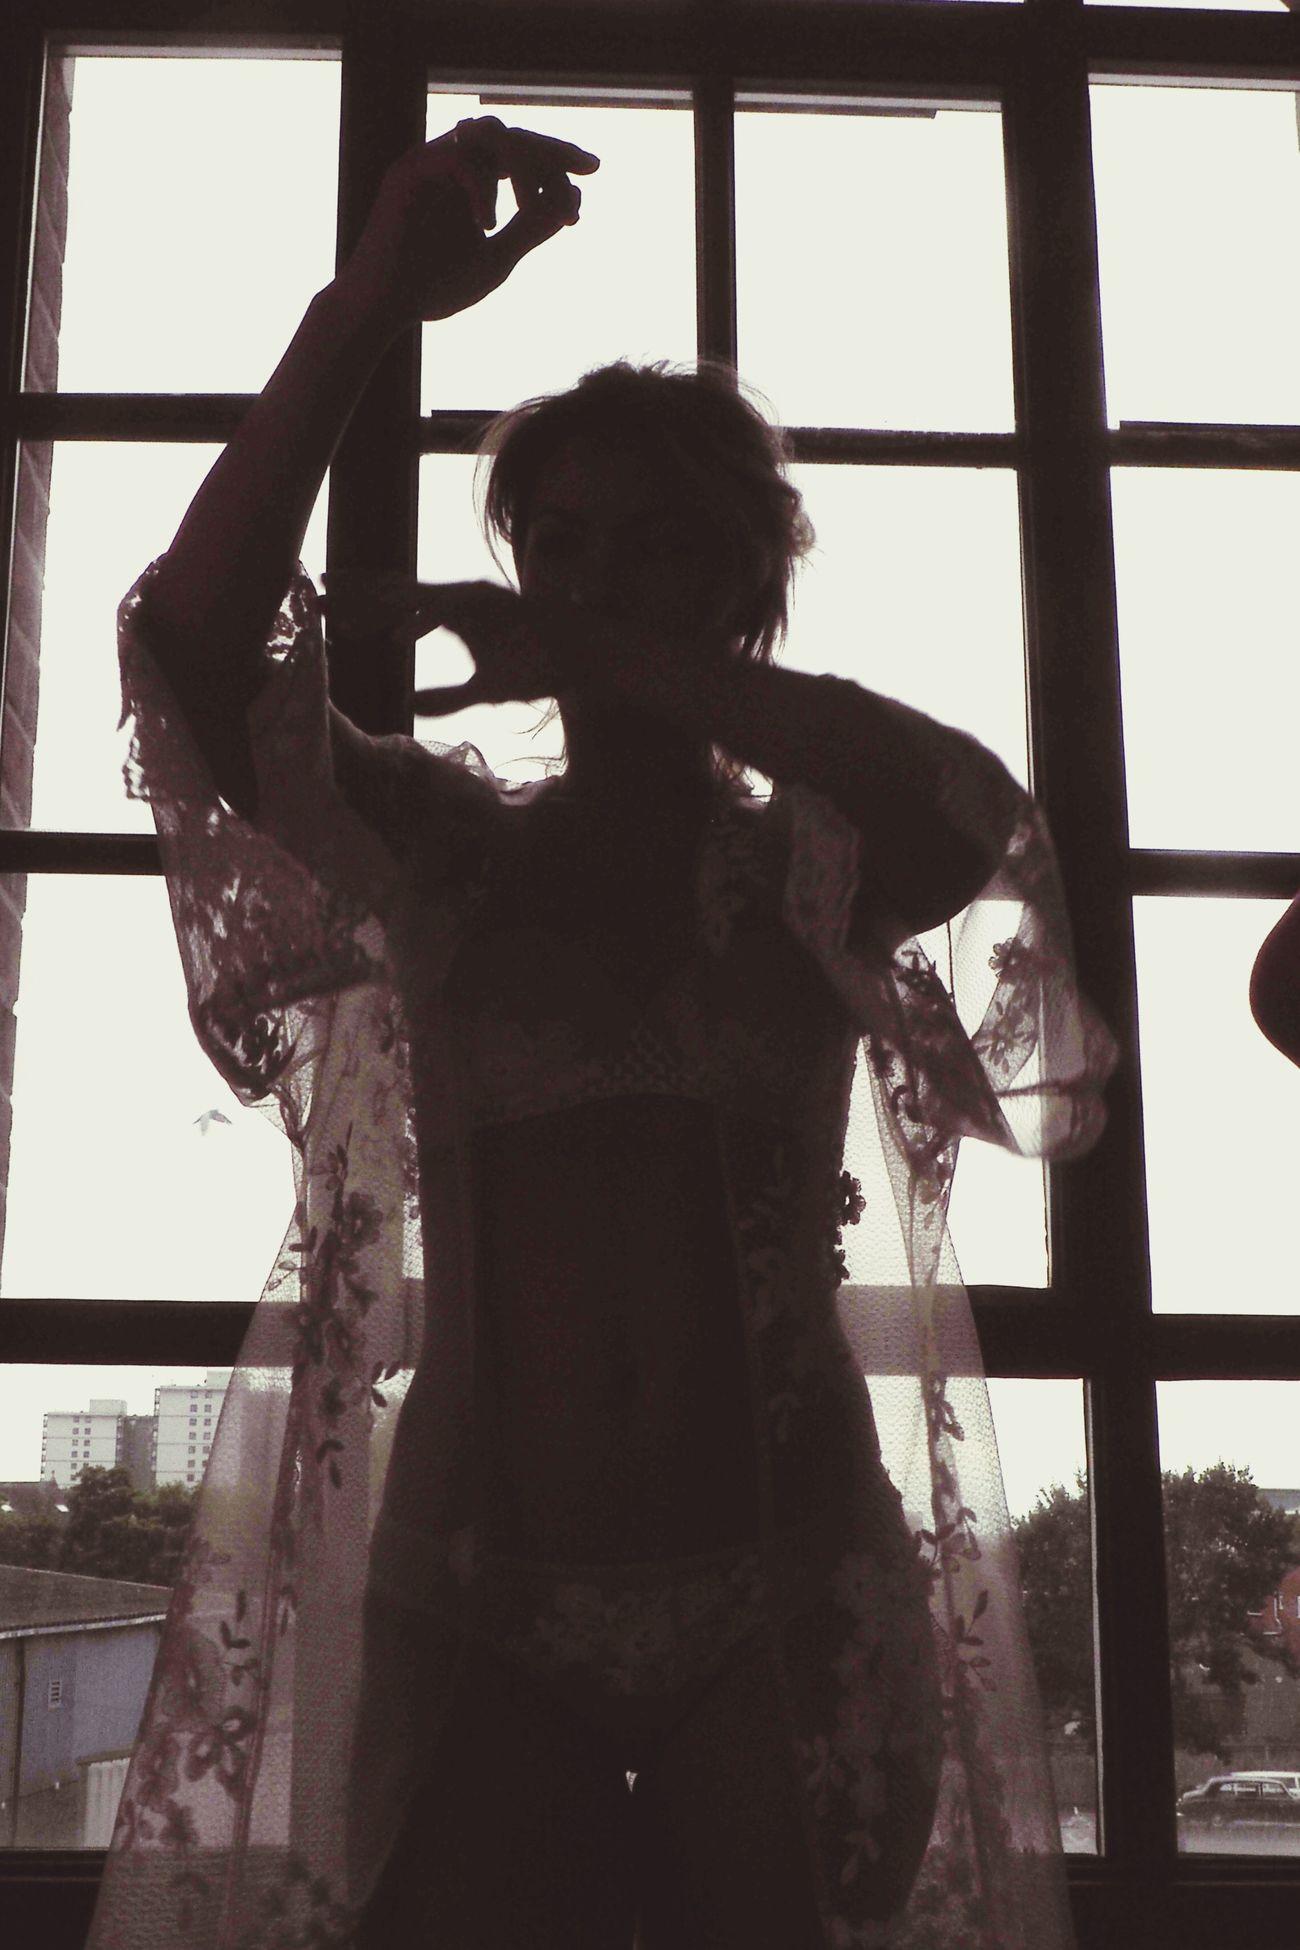 Window Sillouette Light And Shadow Standing Portrait Indoors  Lifestyles Women Fashion Model Light And Shadows The Portraitist - 2017 EyeEm Awards underwear Underwearmodel Underwear😈 Olympus